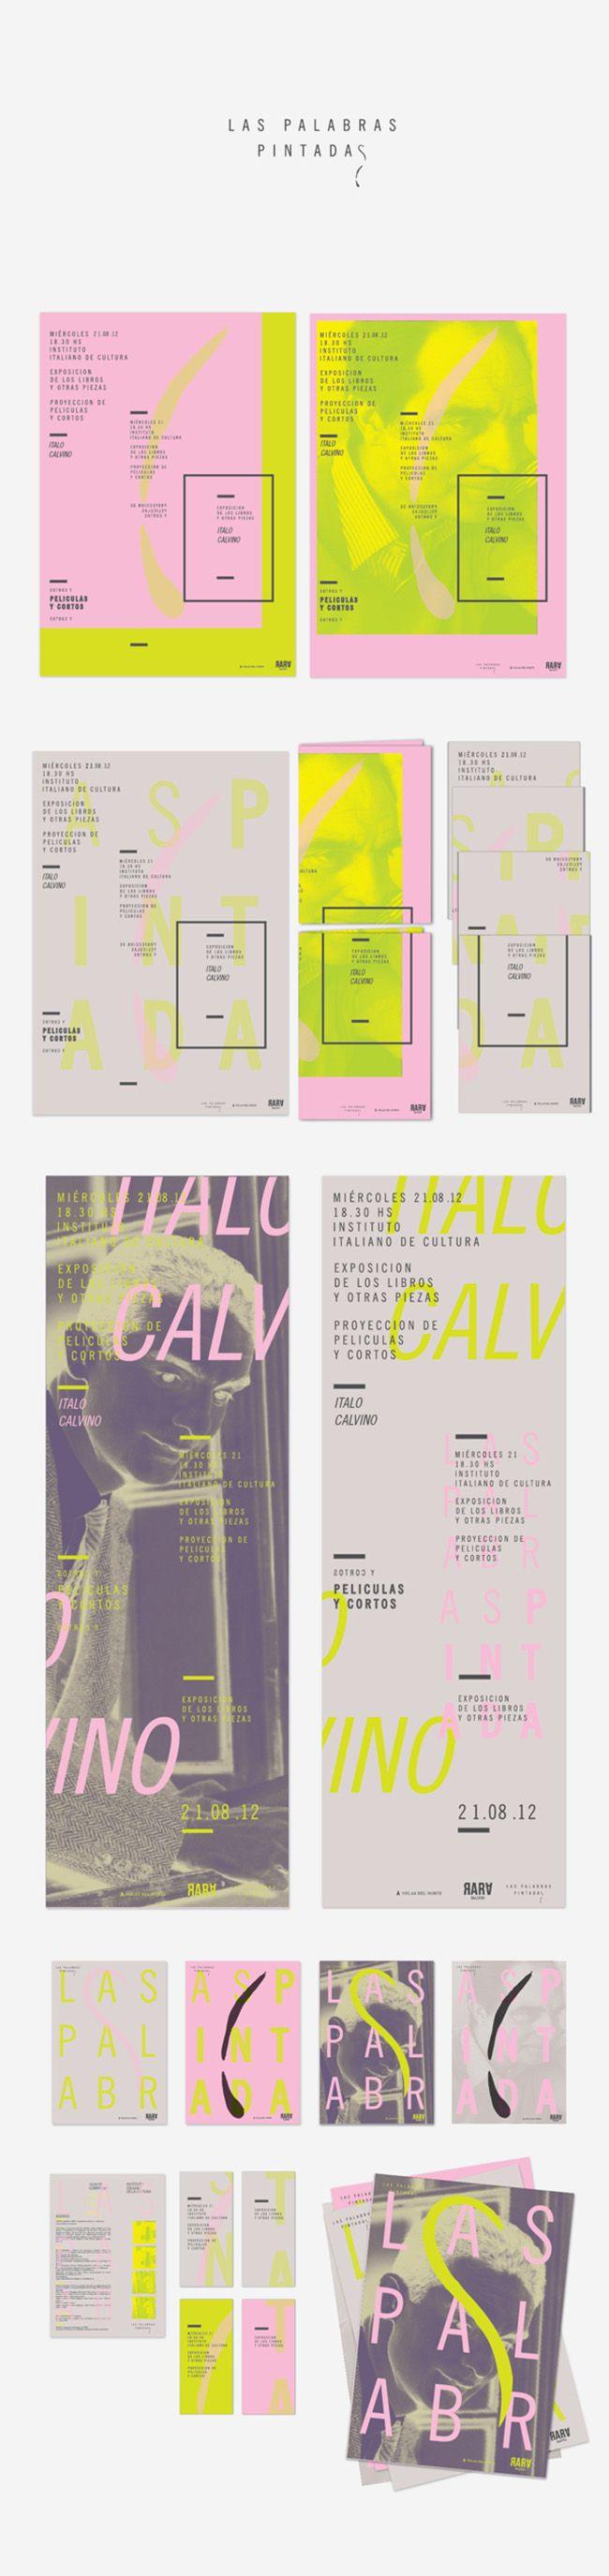 Soft neon / Las Palabras Pintadas branding by Lucía Izco